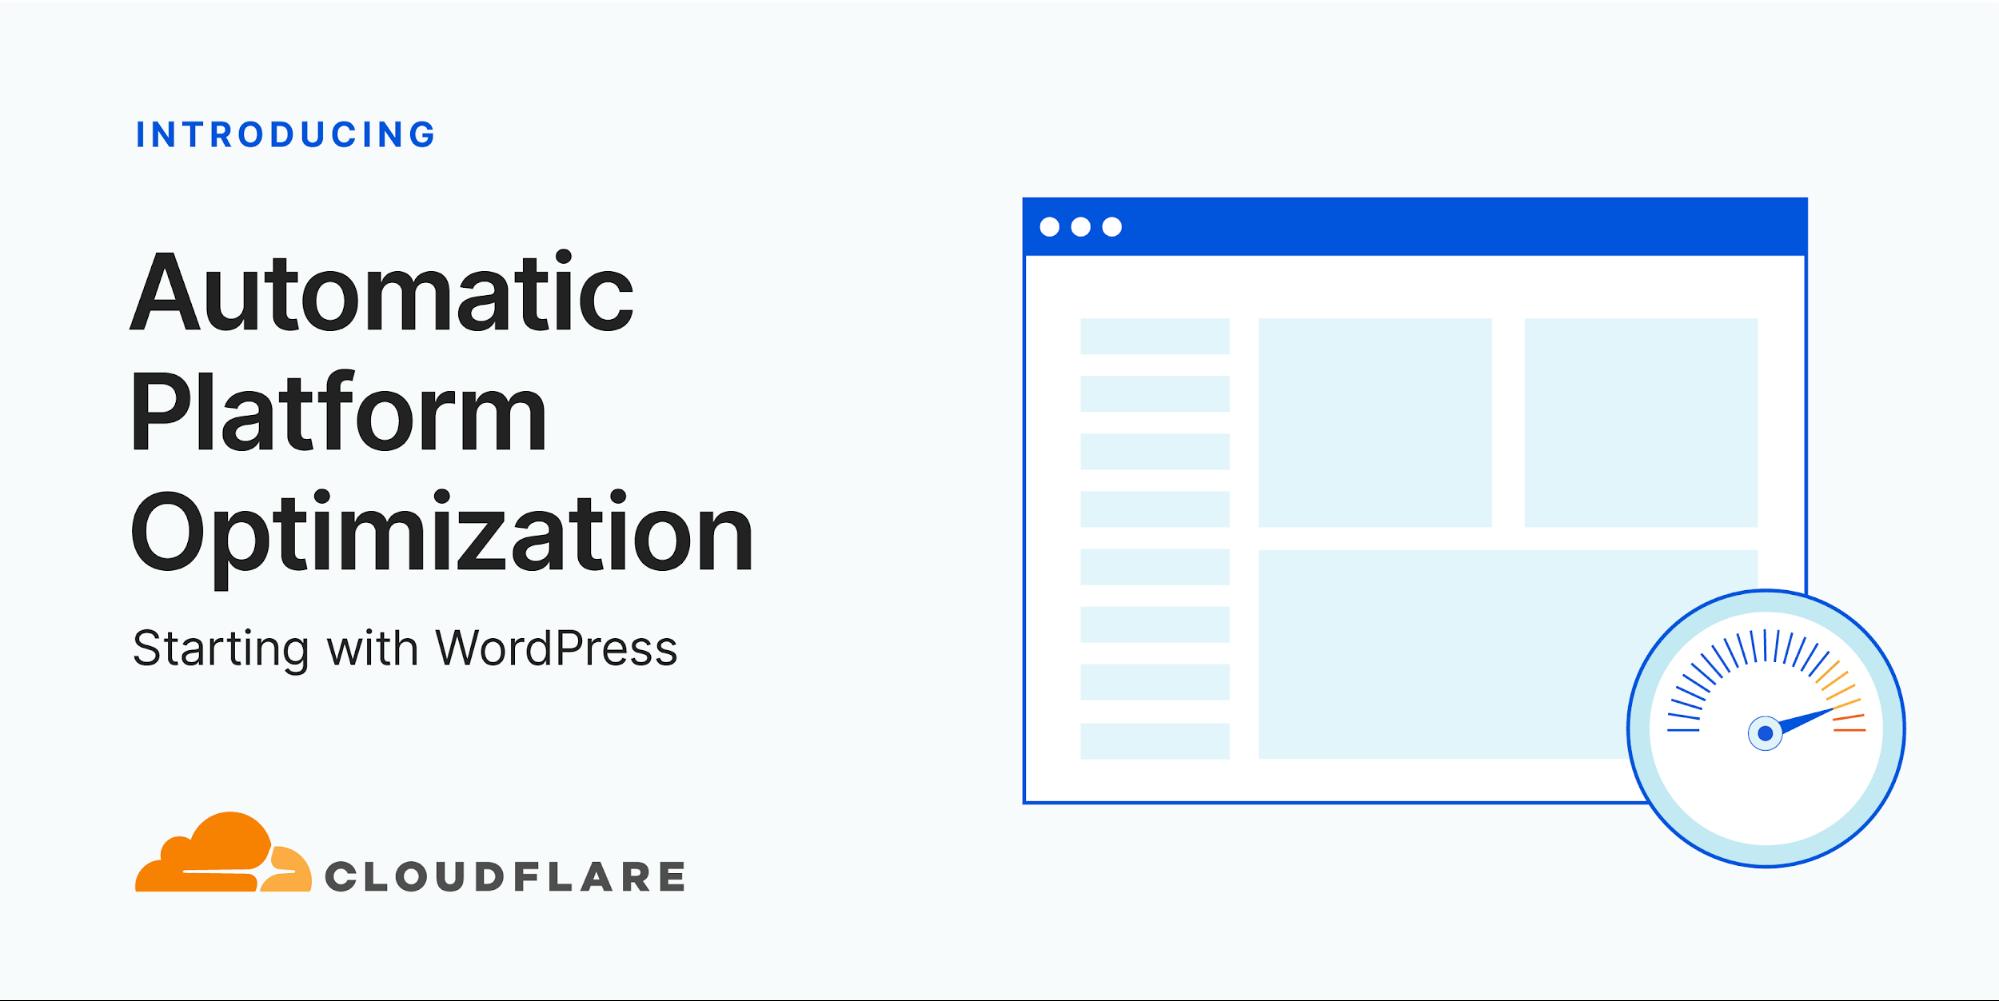 Introducing Automatic Platform Optimization, starting with WordPress